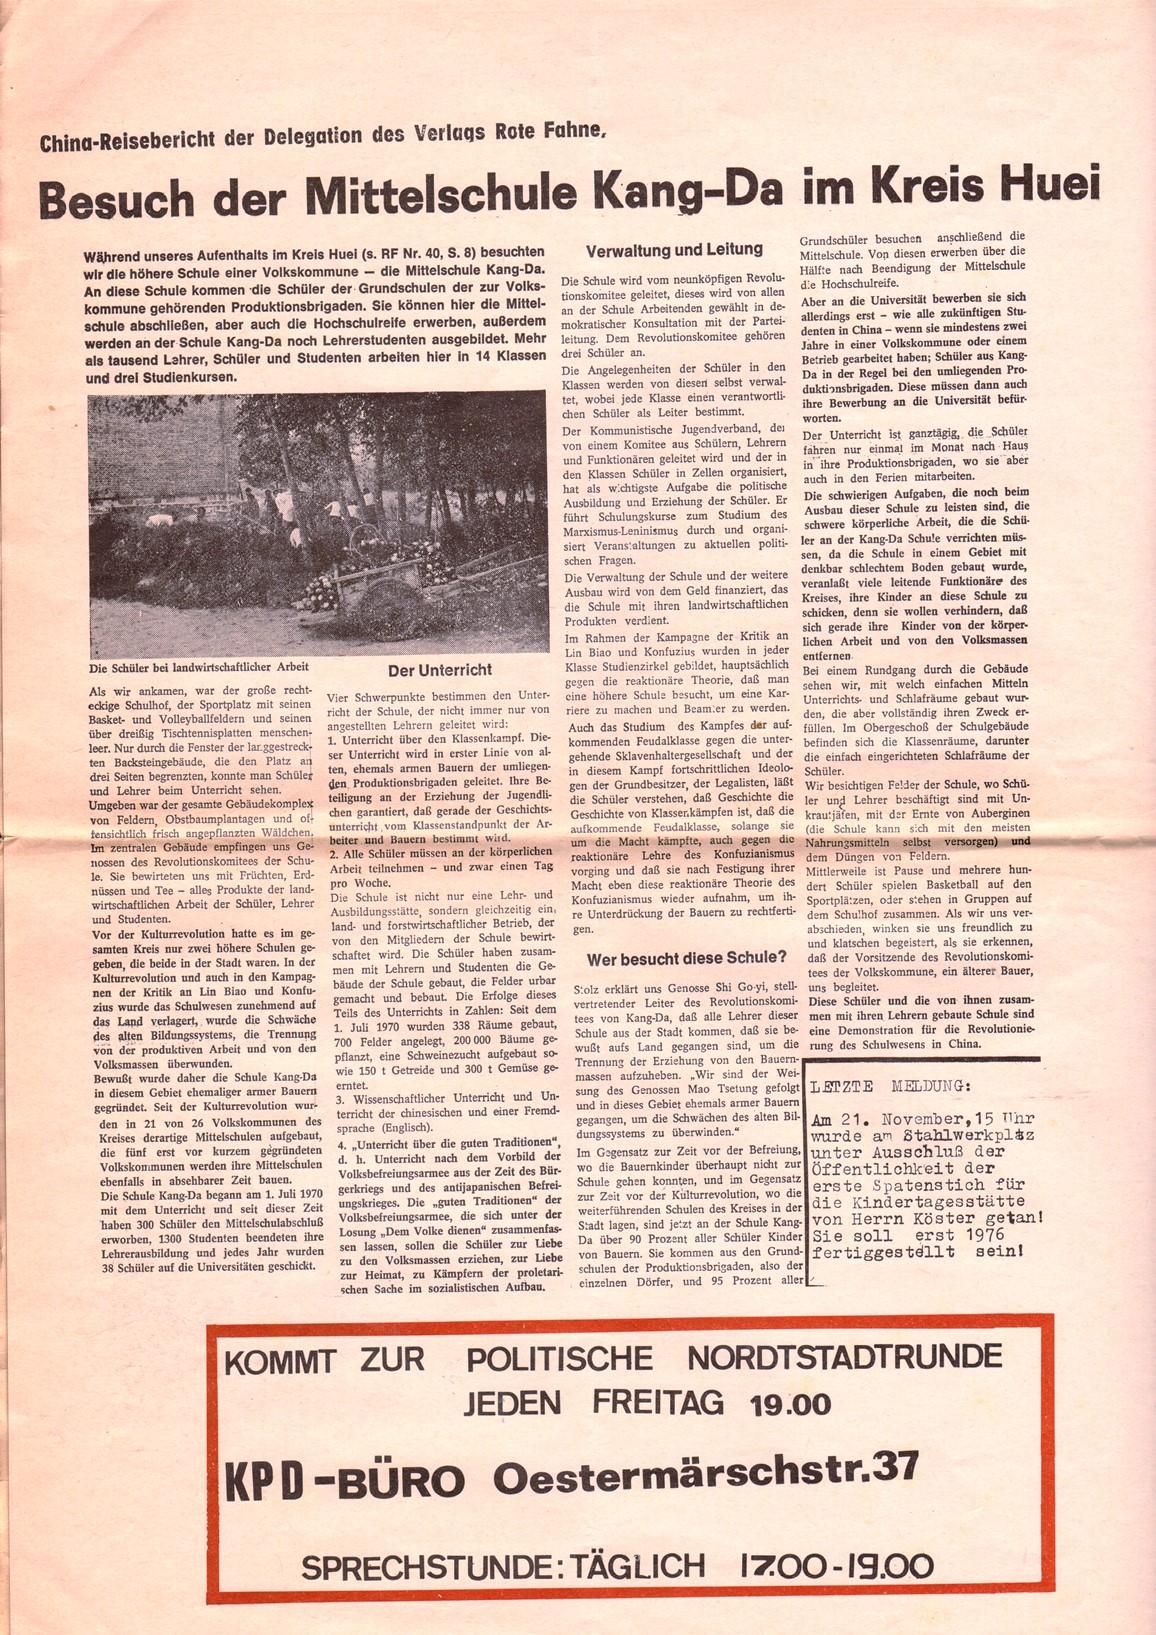 Dortmund_KPD_Kaempfende_Nordstadt_19741100_04